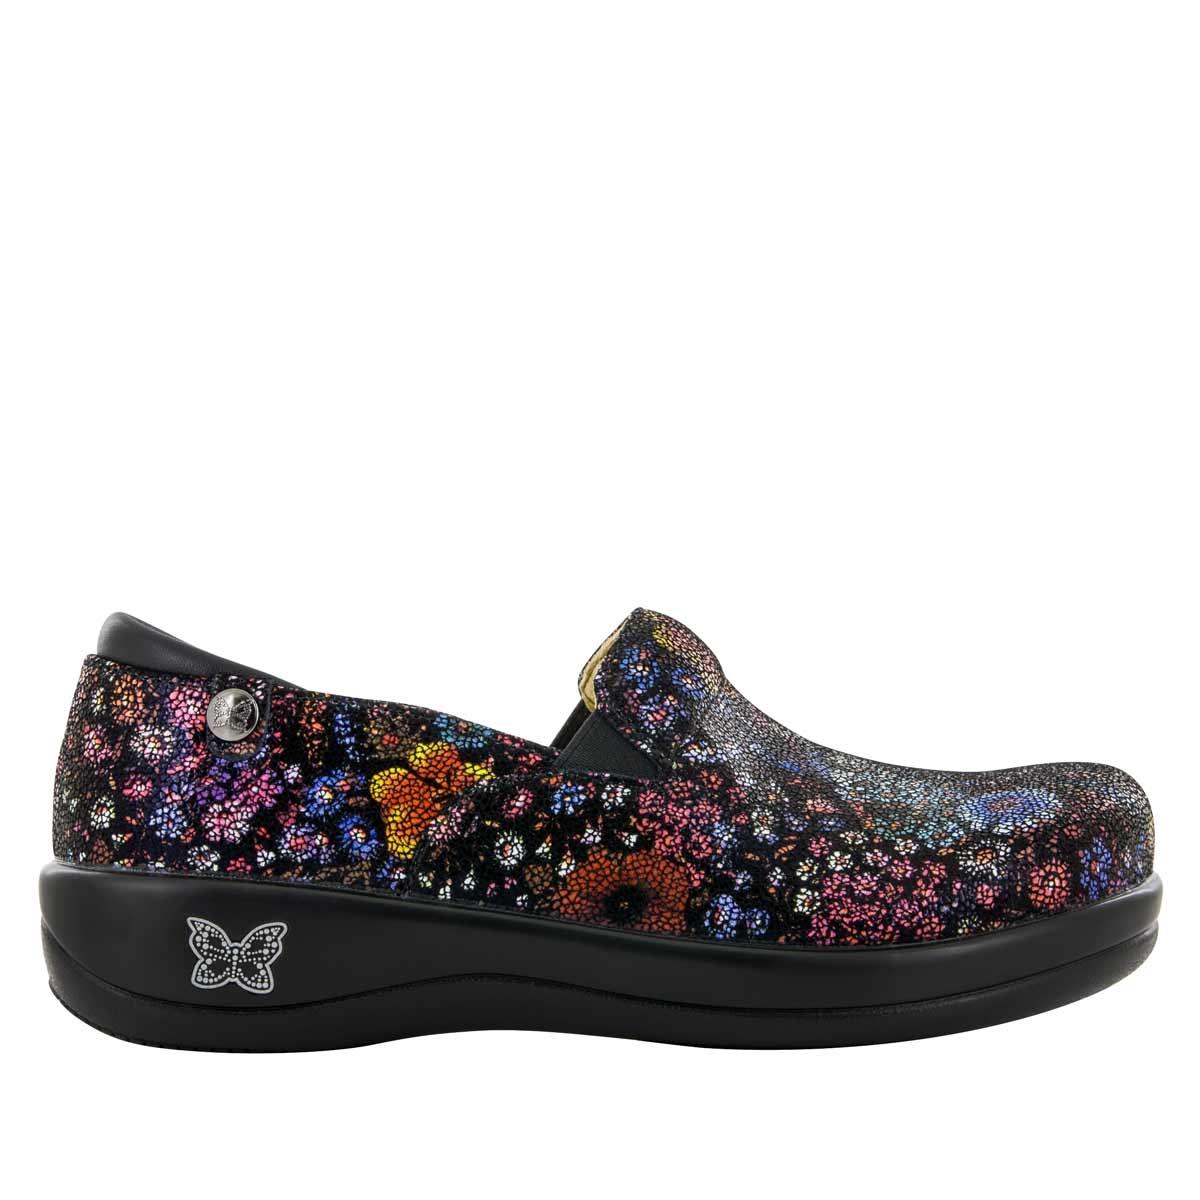 Alegria Shoes Keli Pro Midnight Garden